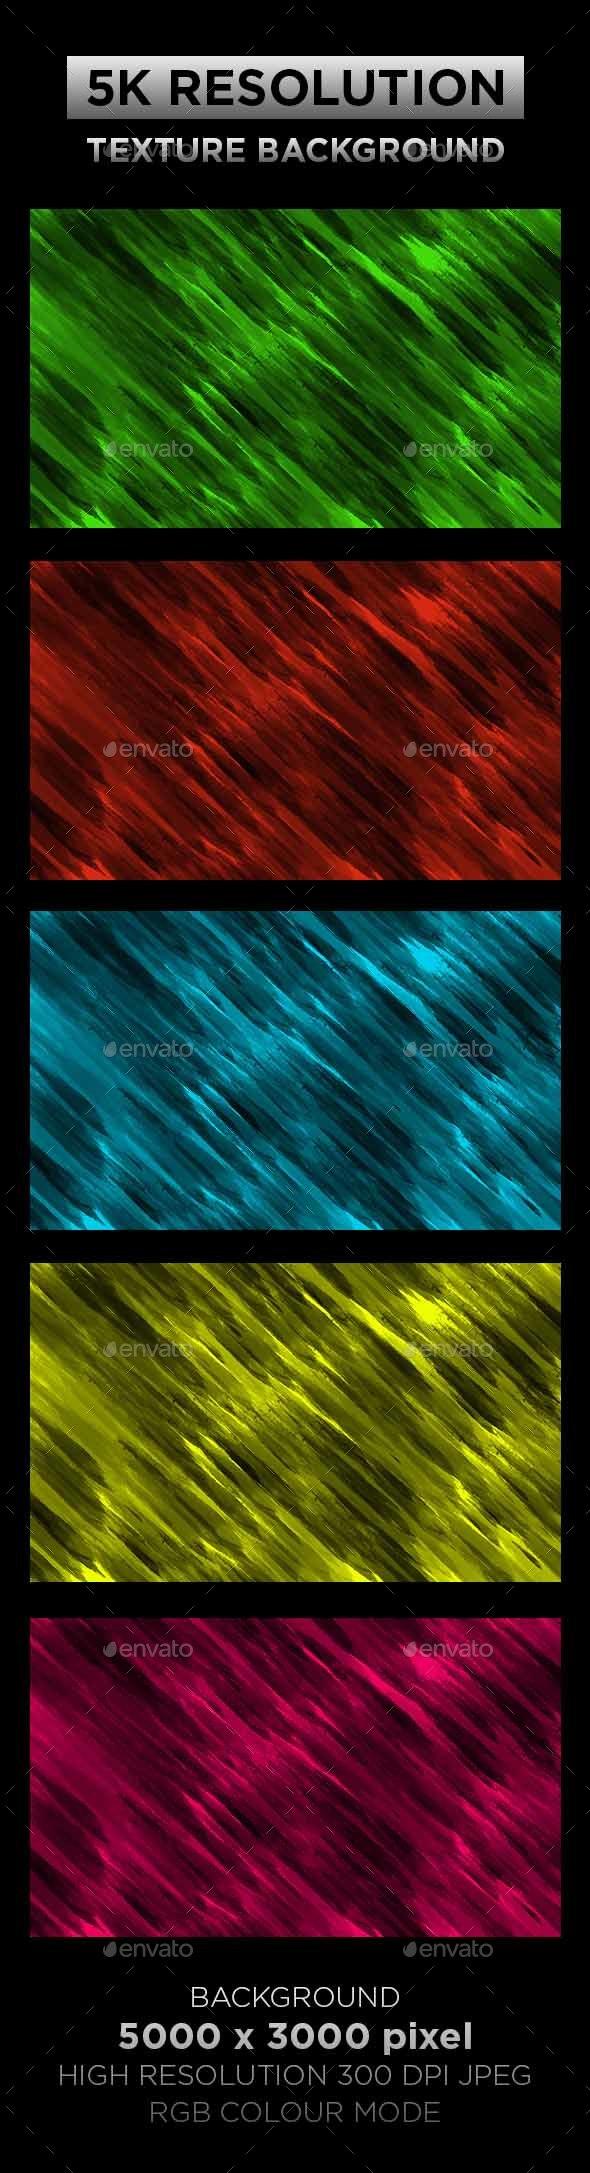 Texture Background Set 007 - Backgrounds Graphics